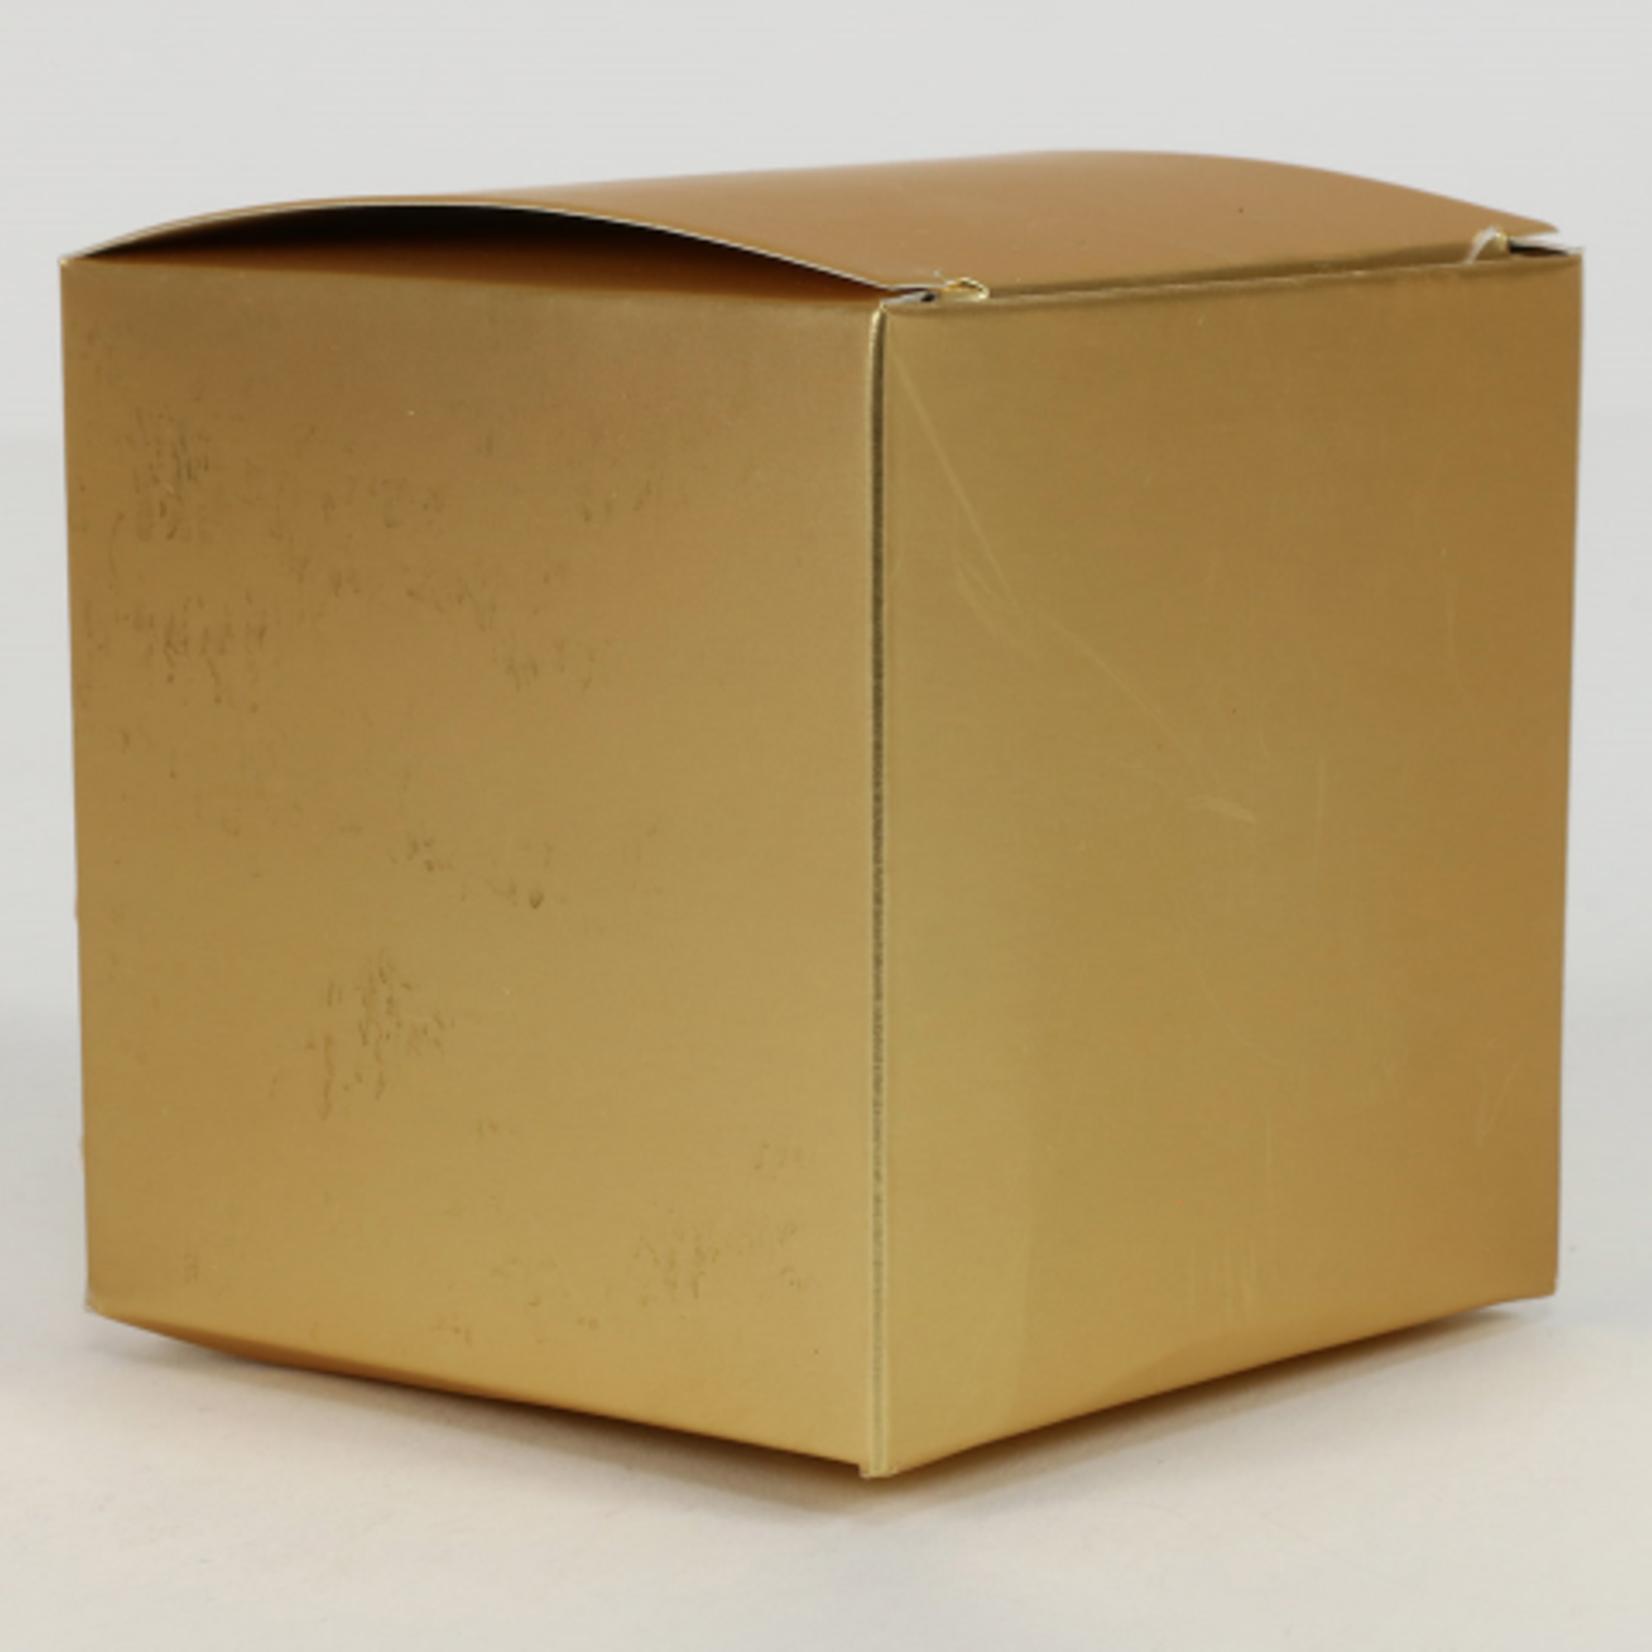 3'' CUBE GOLD BOX